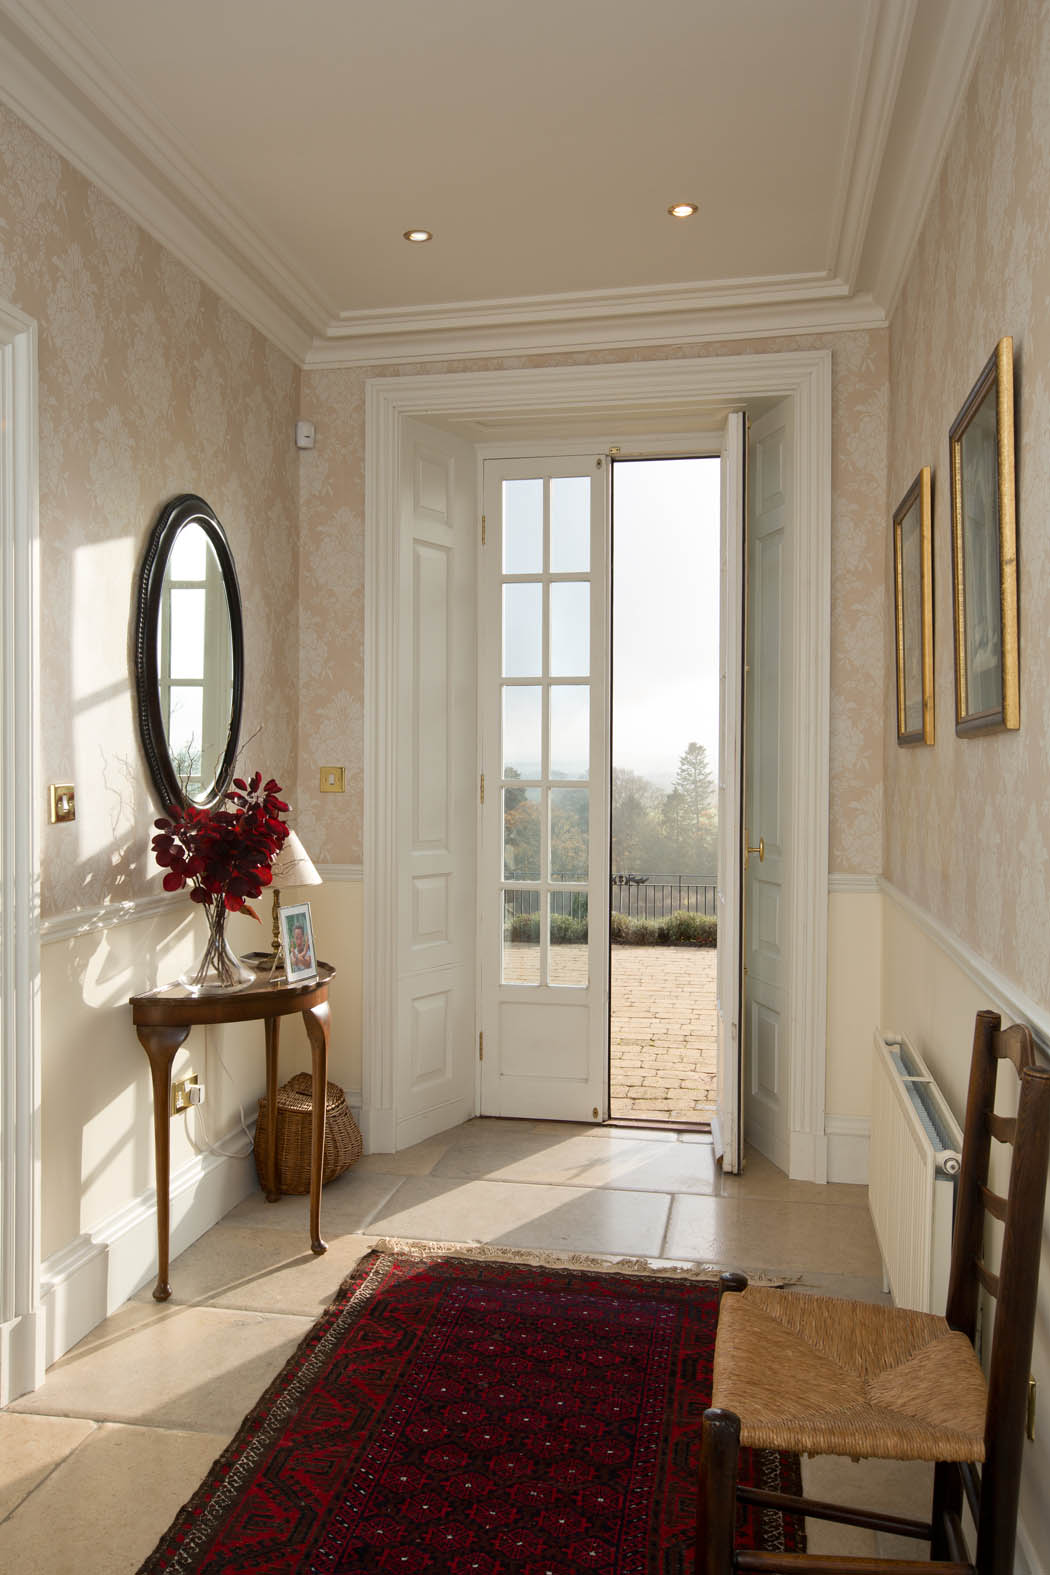 Hallway with views, Bowden House B&B